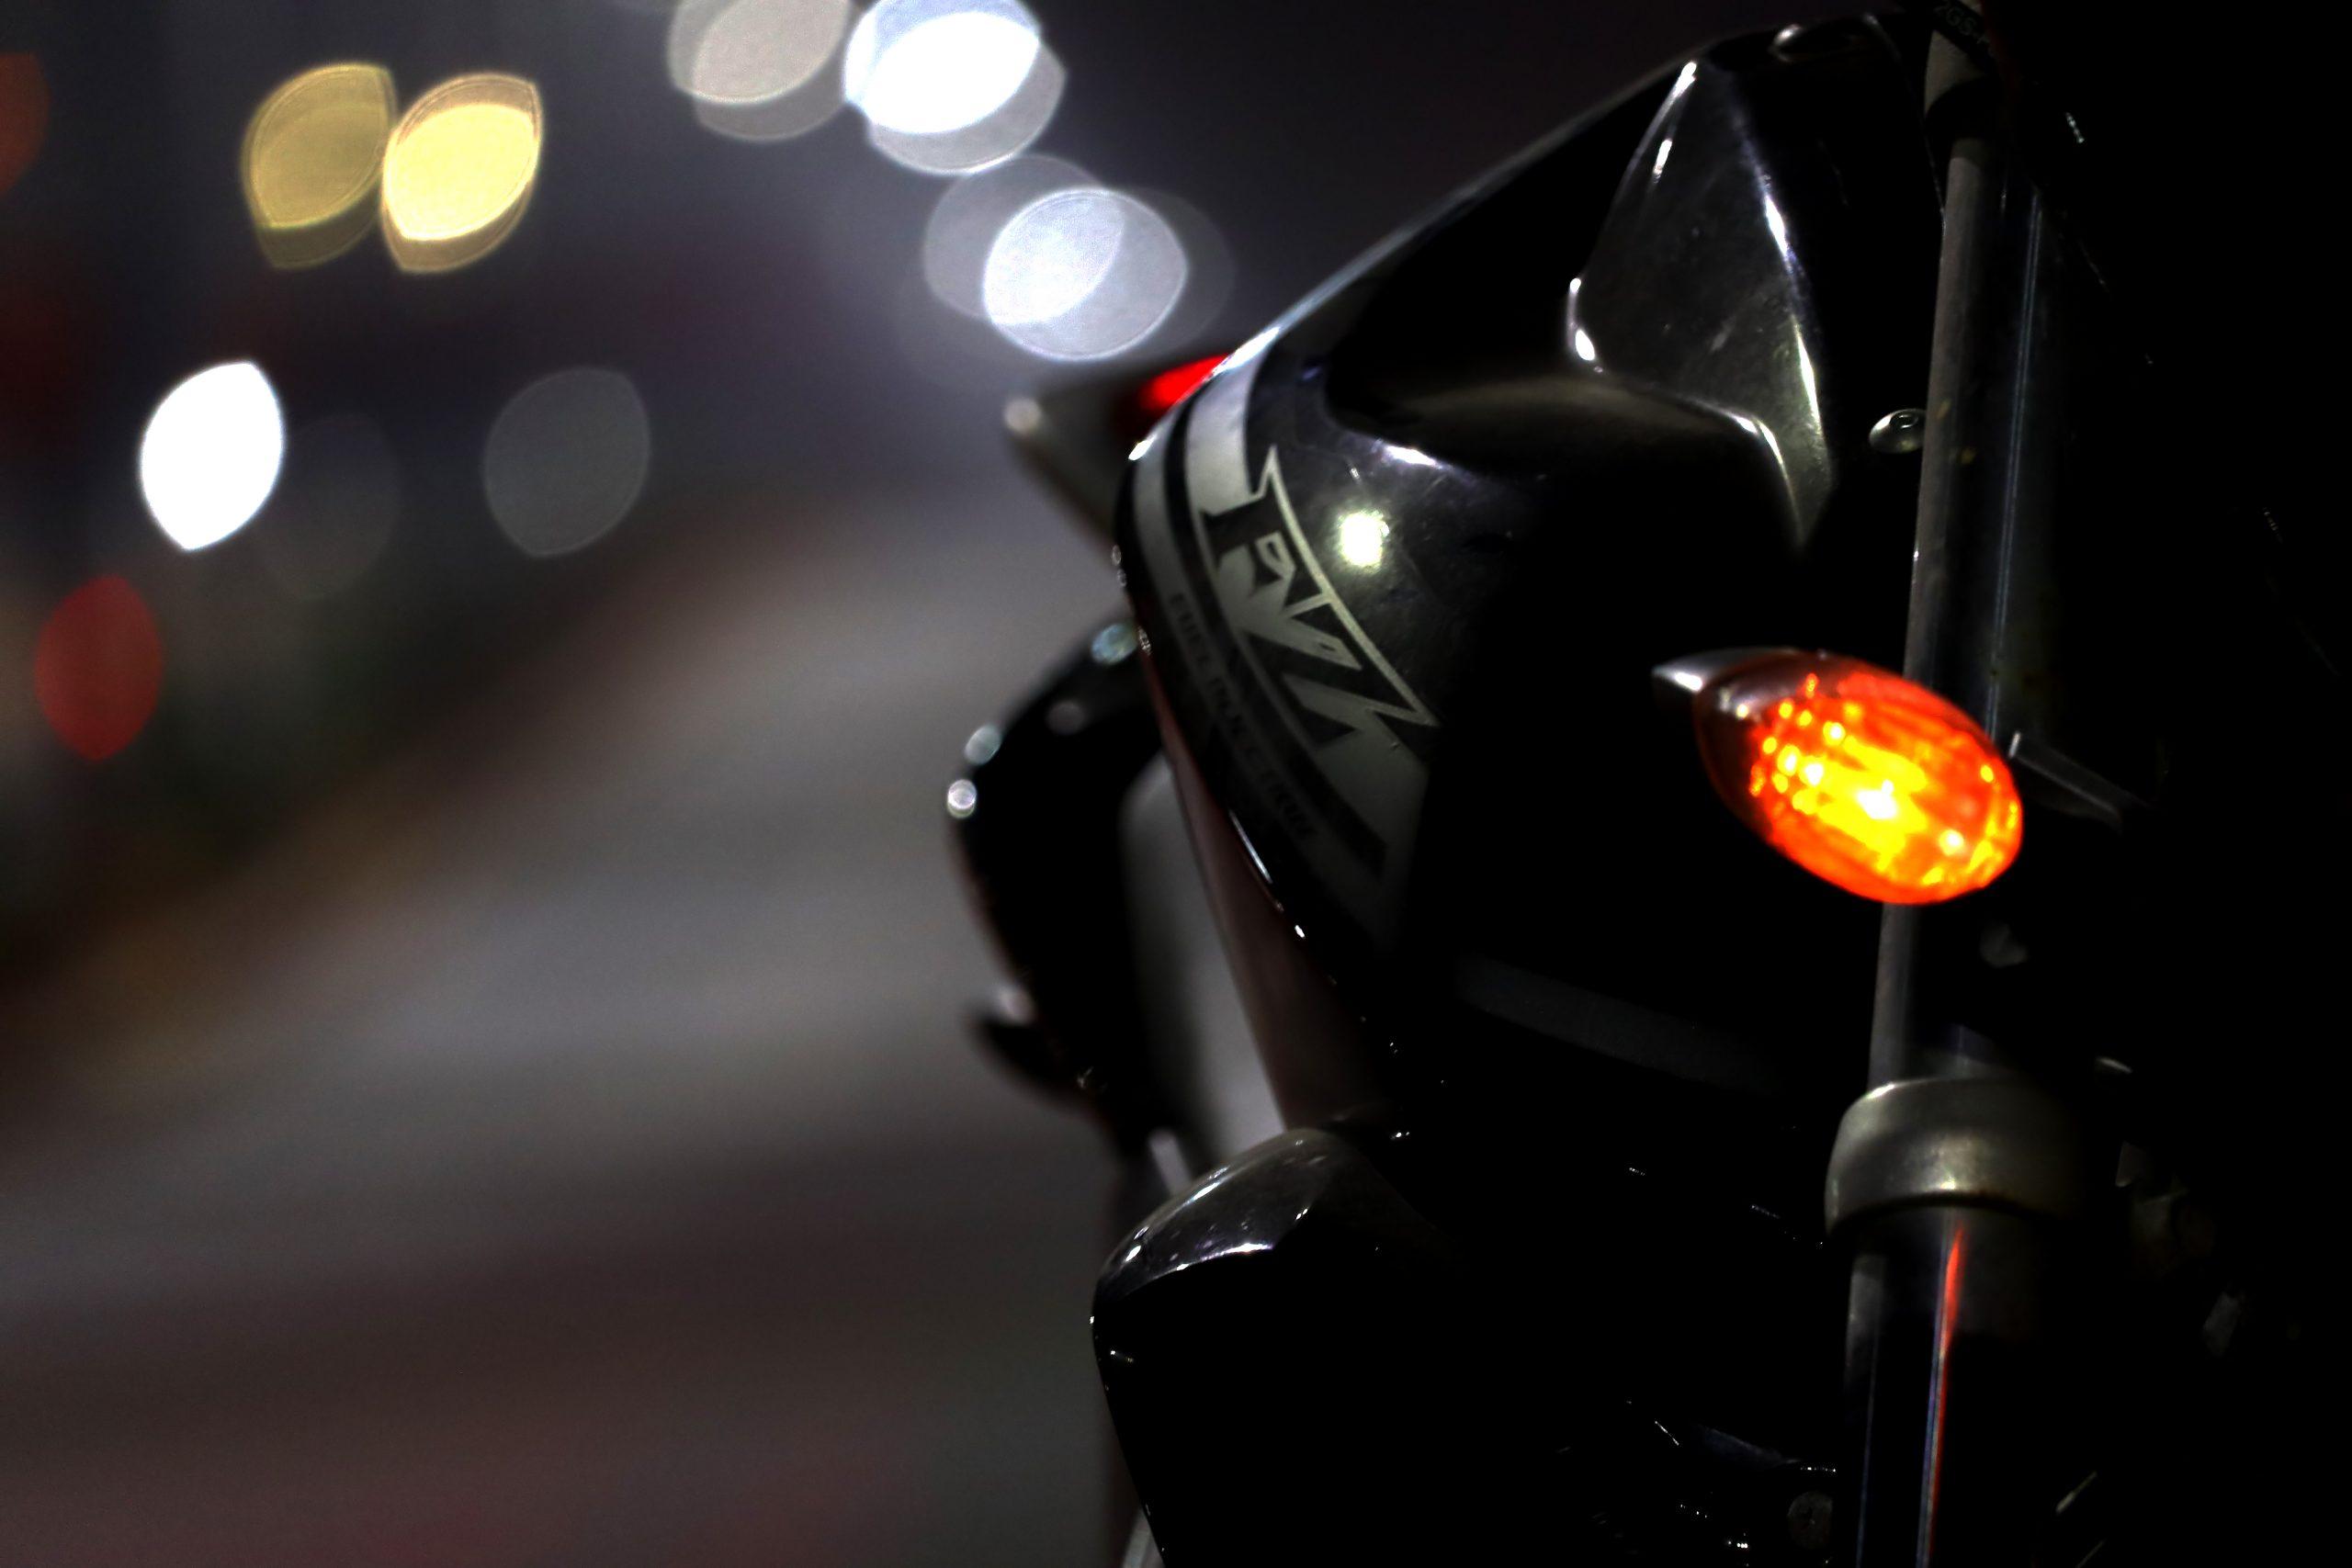 Yamaha Fz bike on bokeh background